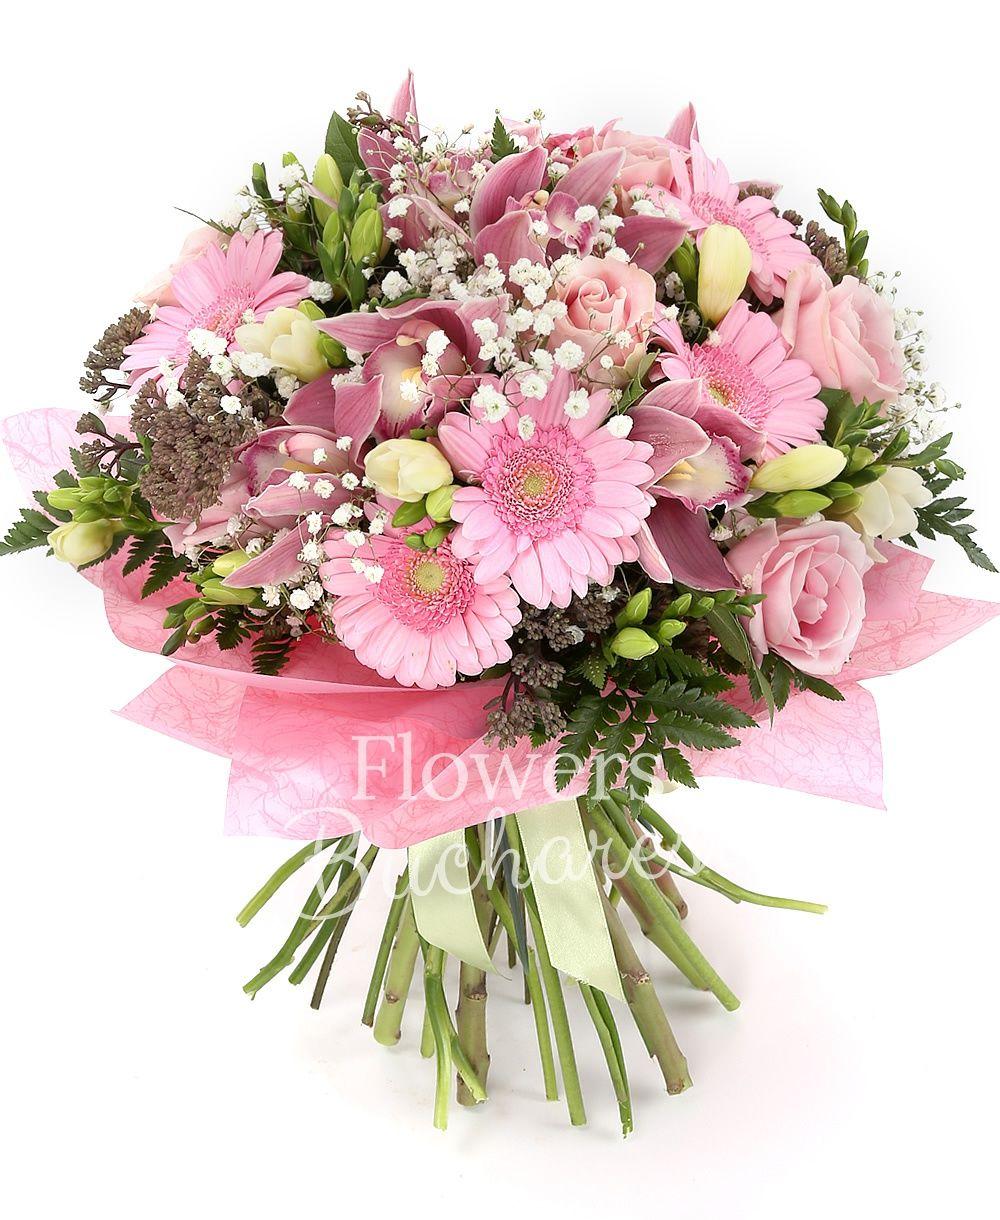 7 pink roses, 5 sedum, 10 white freesias, pink cymbidium, 5 gerbera, greenery